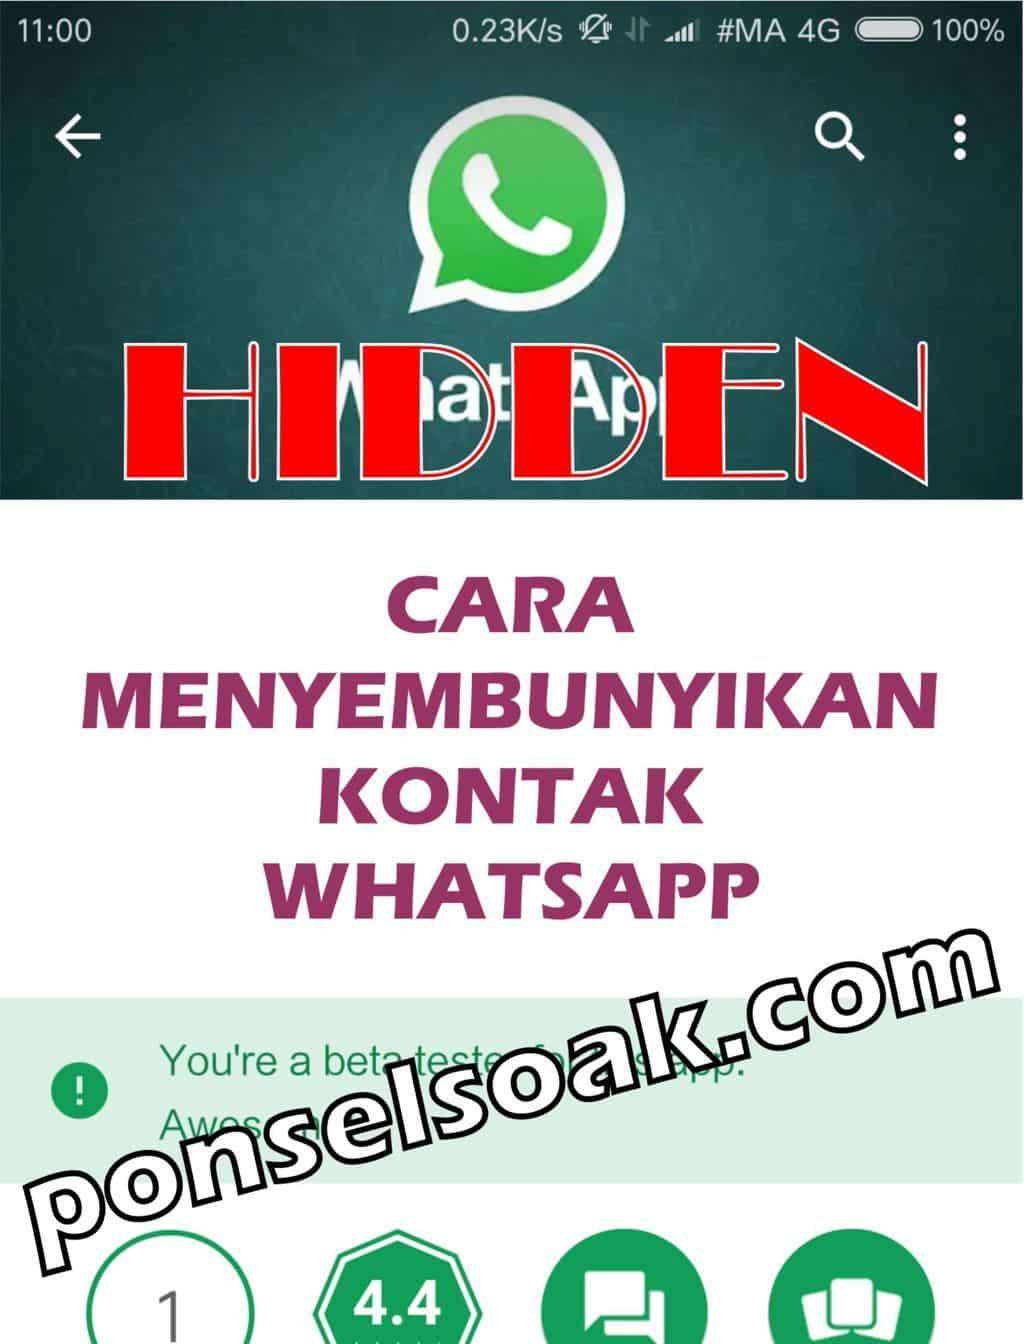 2 cara menyembunyikan kontak whatsapp